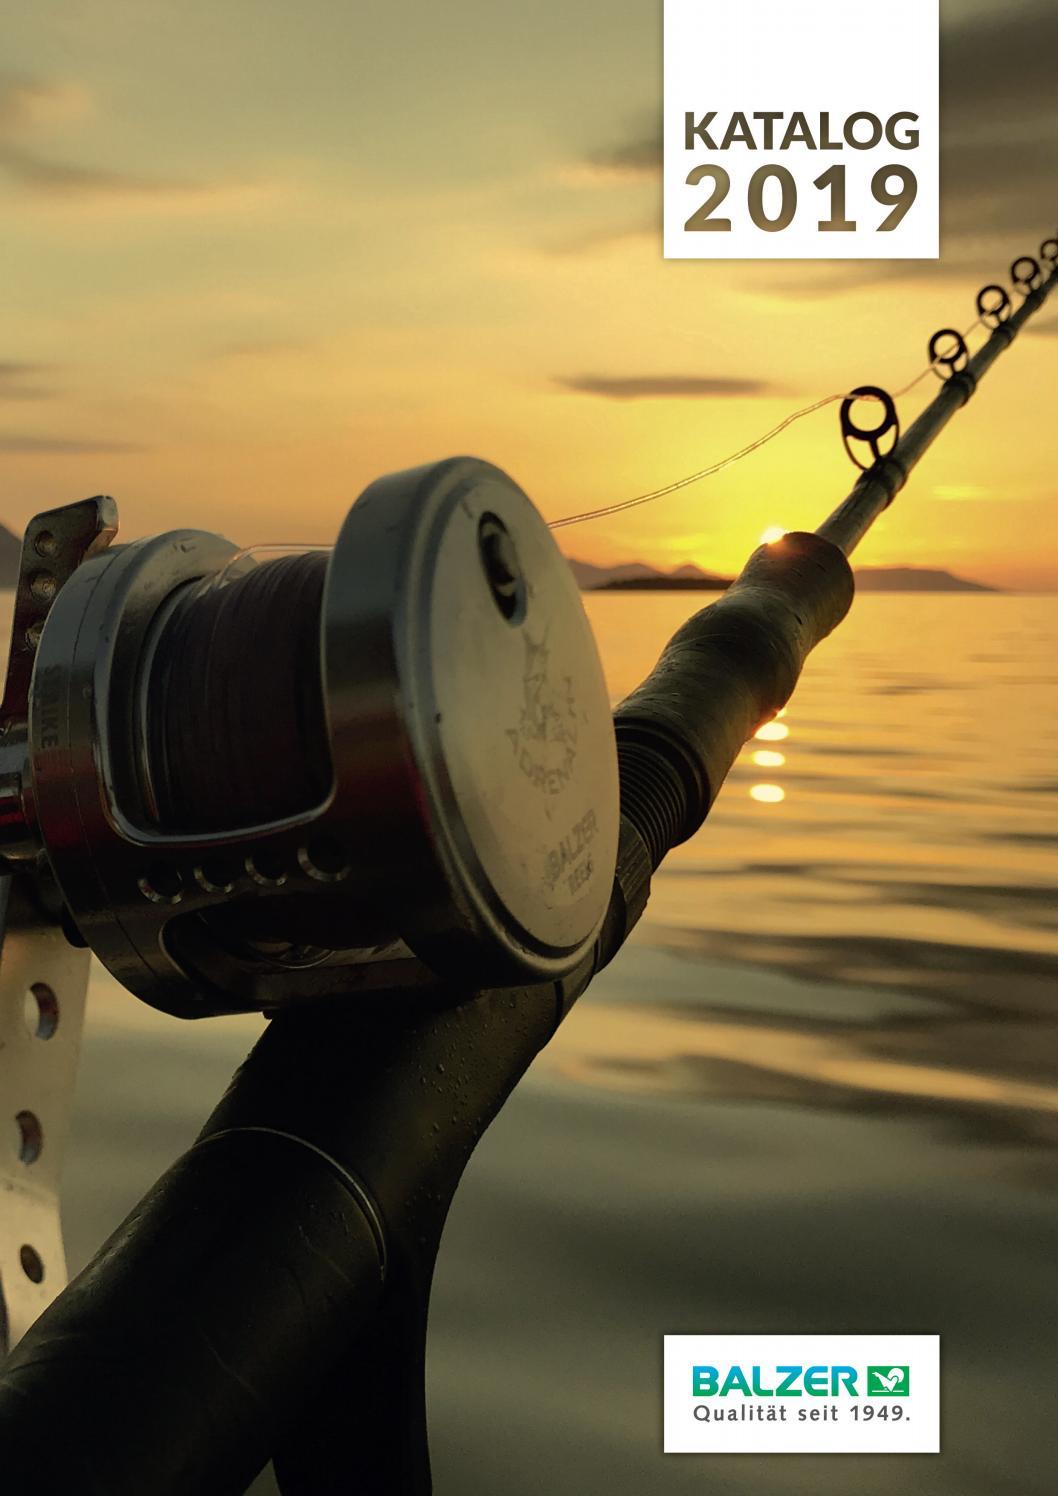 Kugellager Wirbel 80 kg Tragkraft Meeresangeln Wels Waller-Fischen Heilbutt